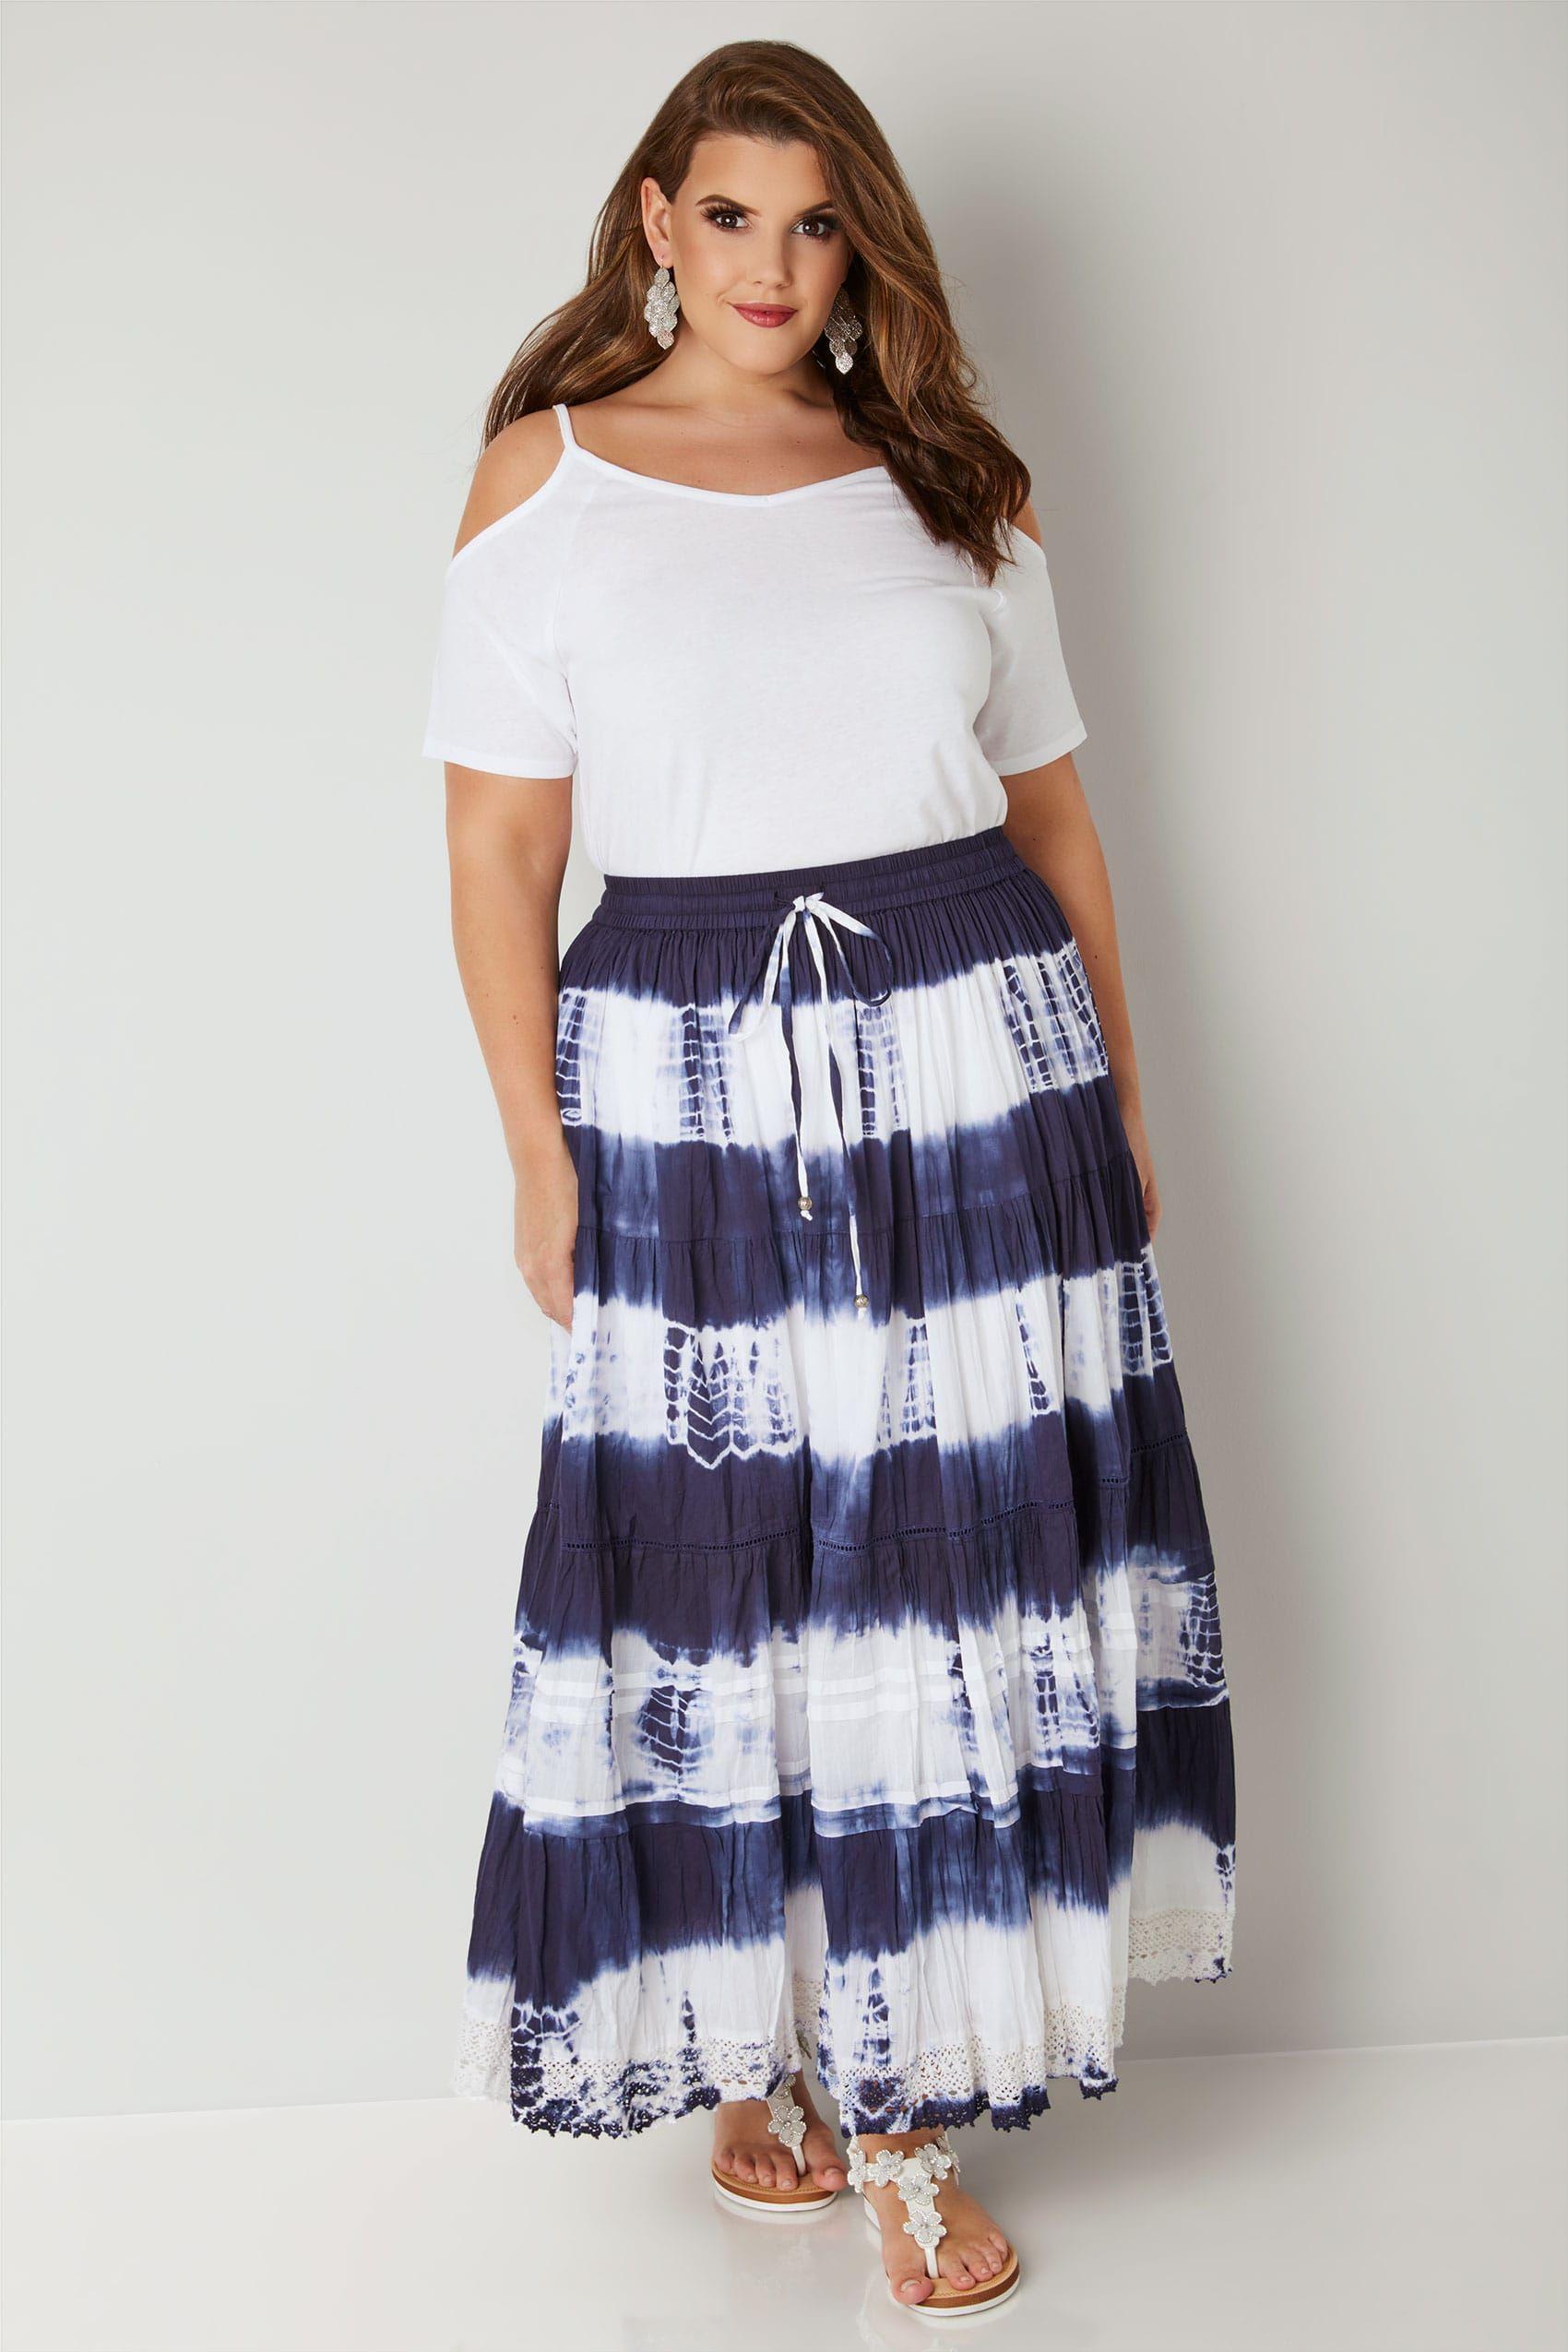 256b239c50275 White & Navy Tie Dye Tiered Maxi Skirt With Lace Trim Hem, Plus size 16 to  32